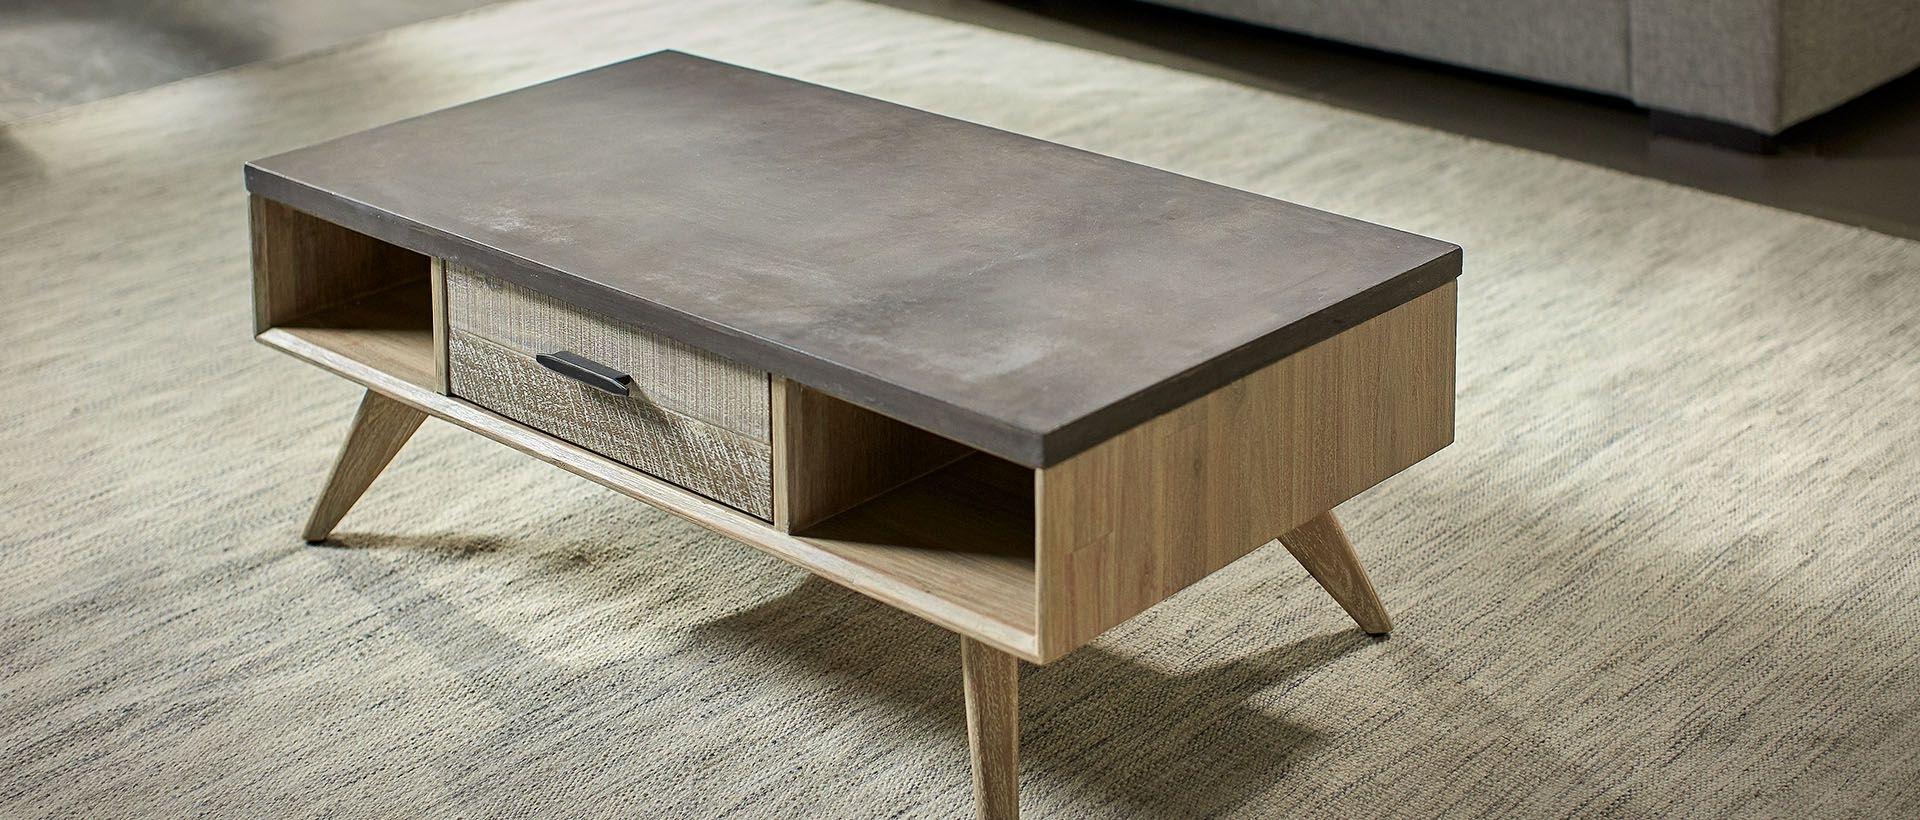 Nick Scali Furniture (Gallery 14 of 20)